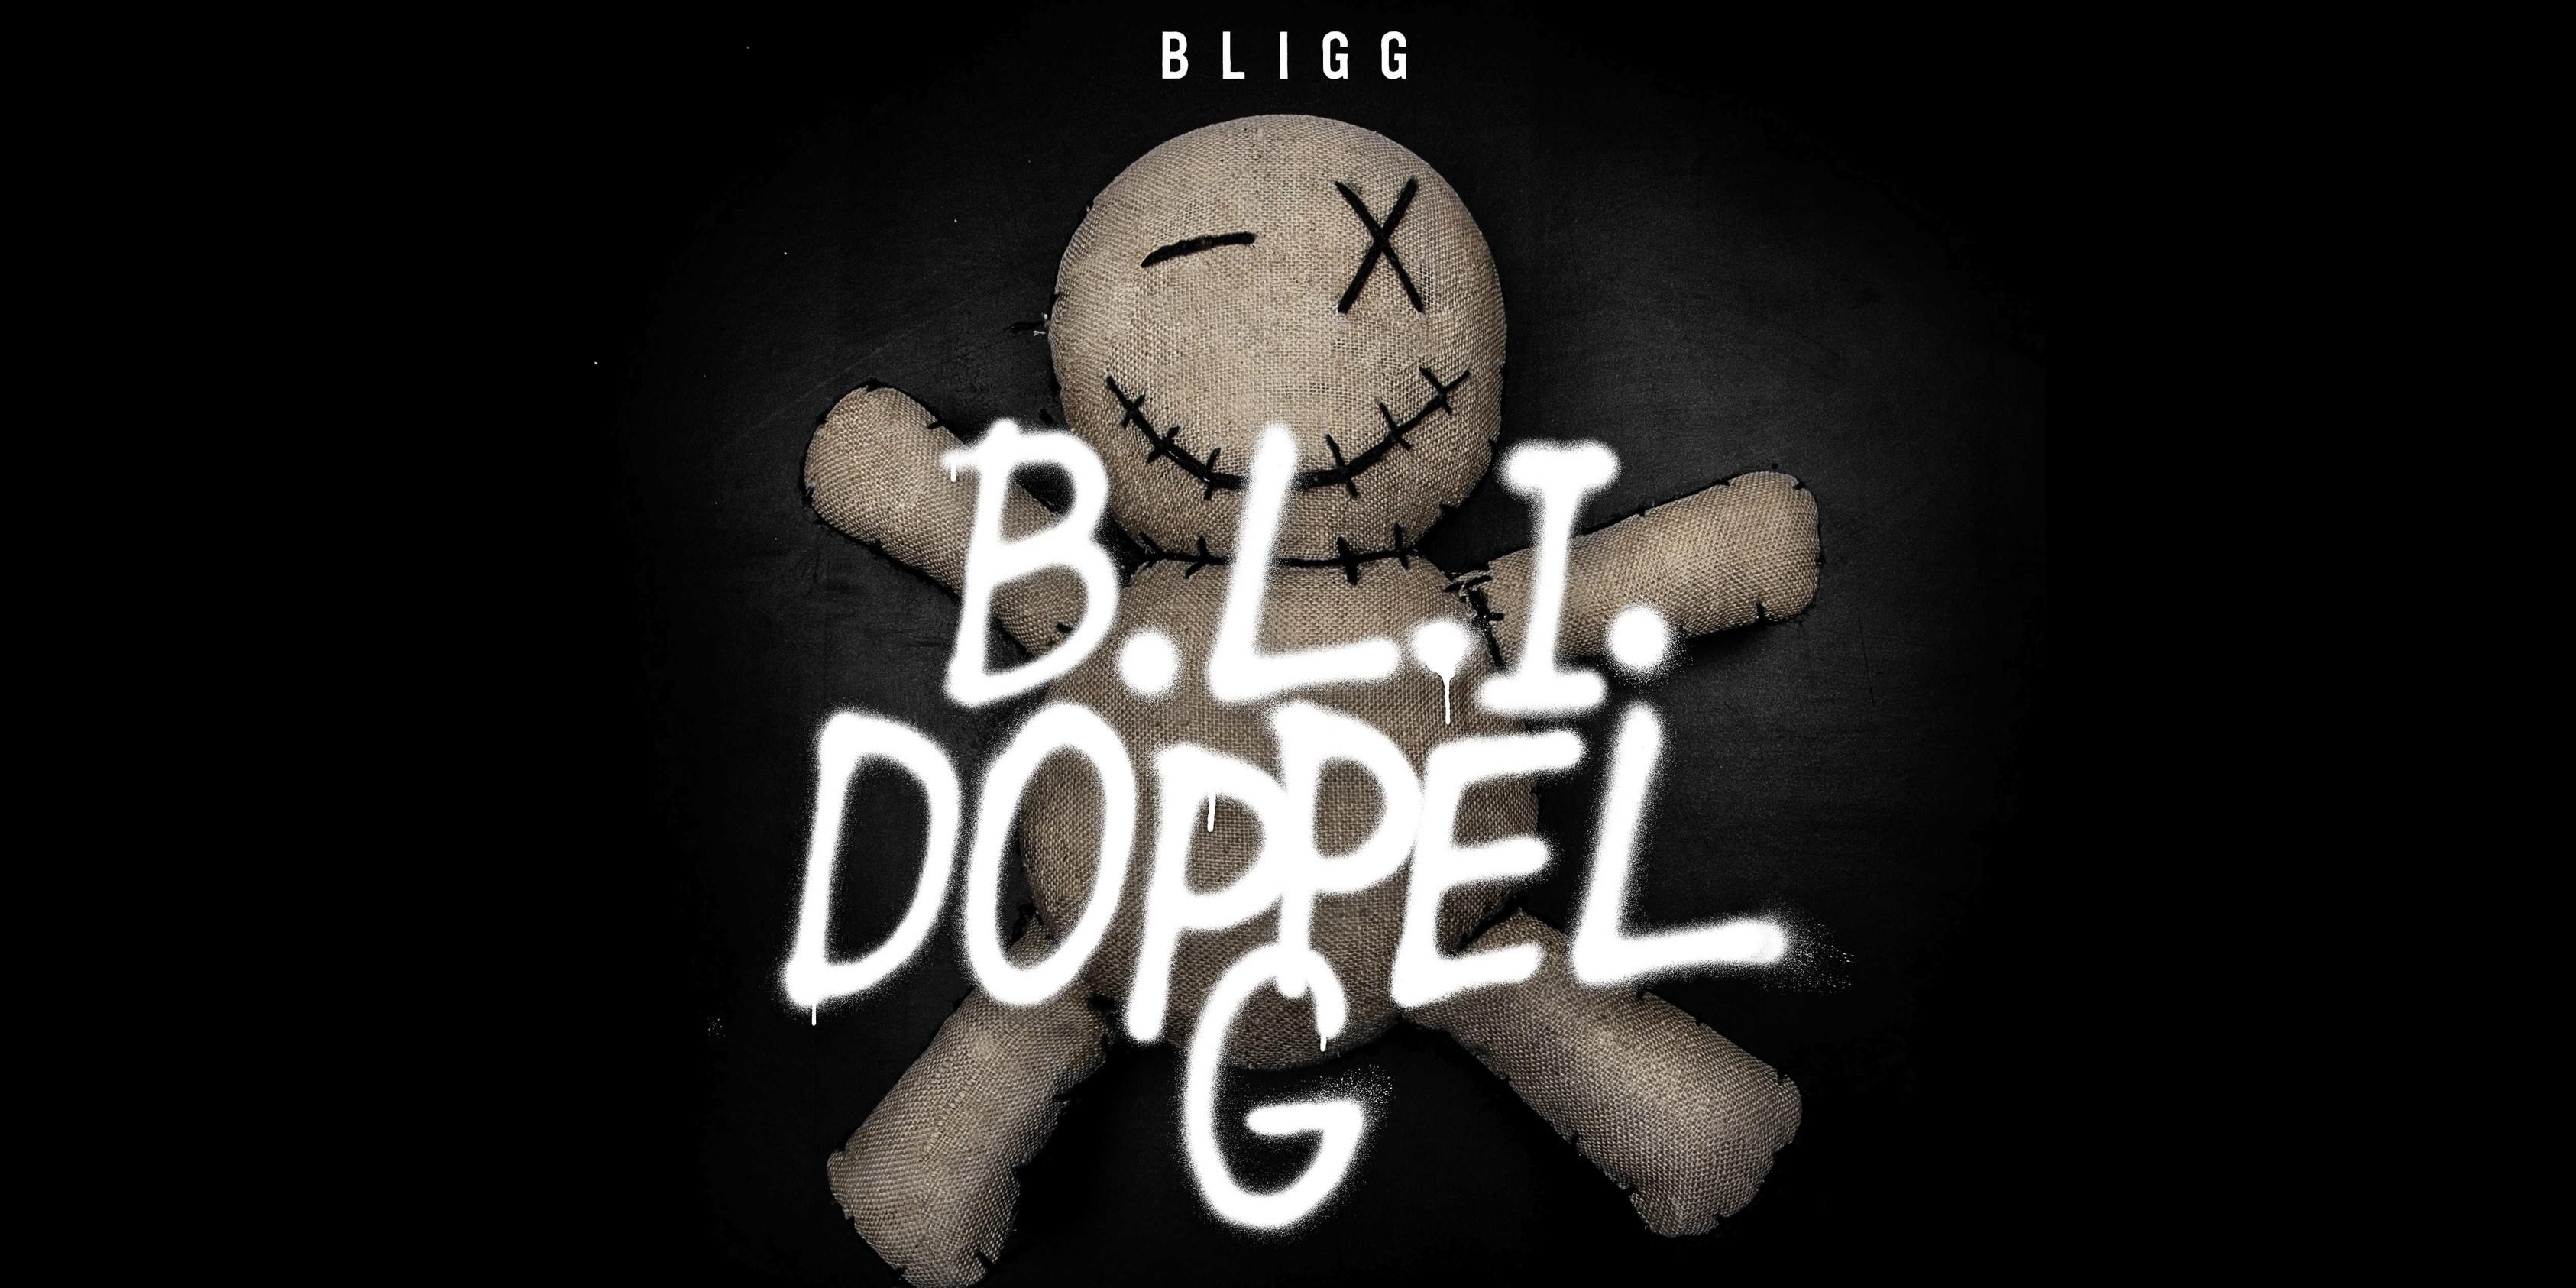 Bligg bringt den HipHop-Flavour zurück